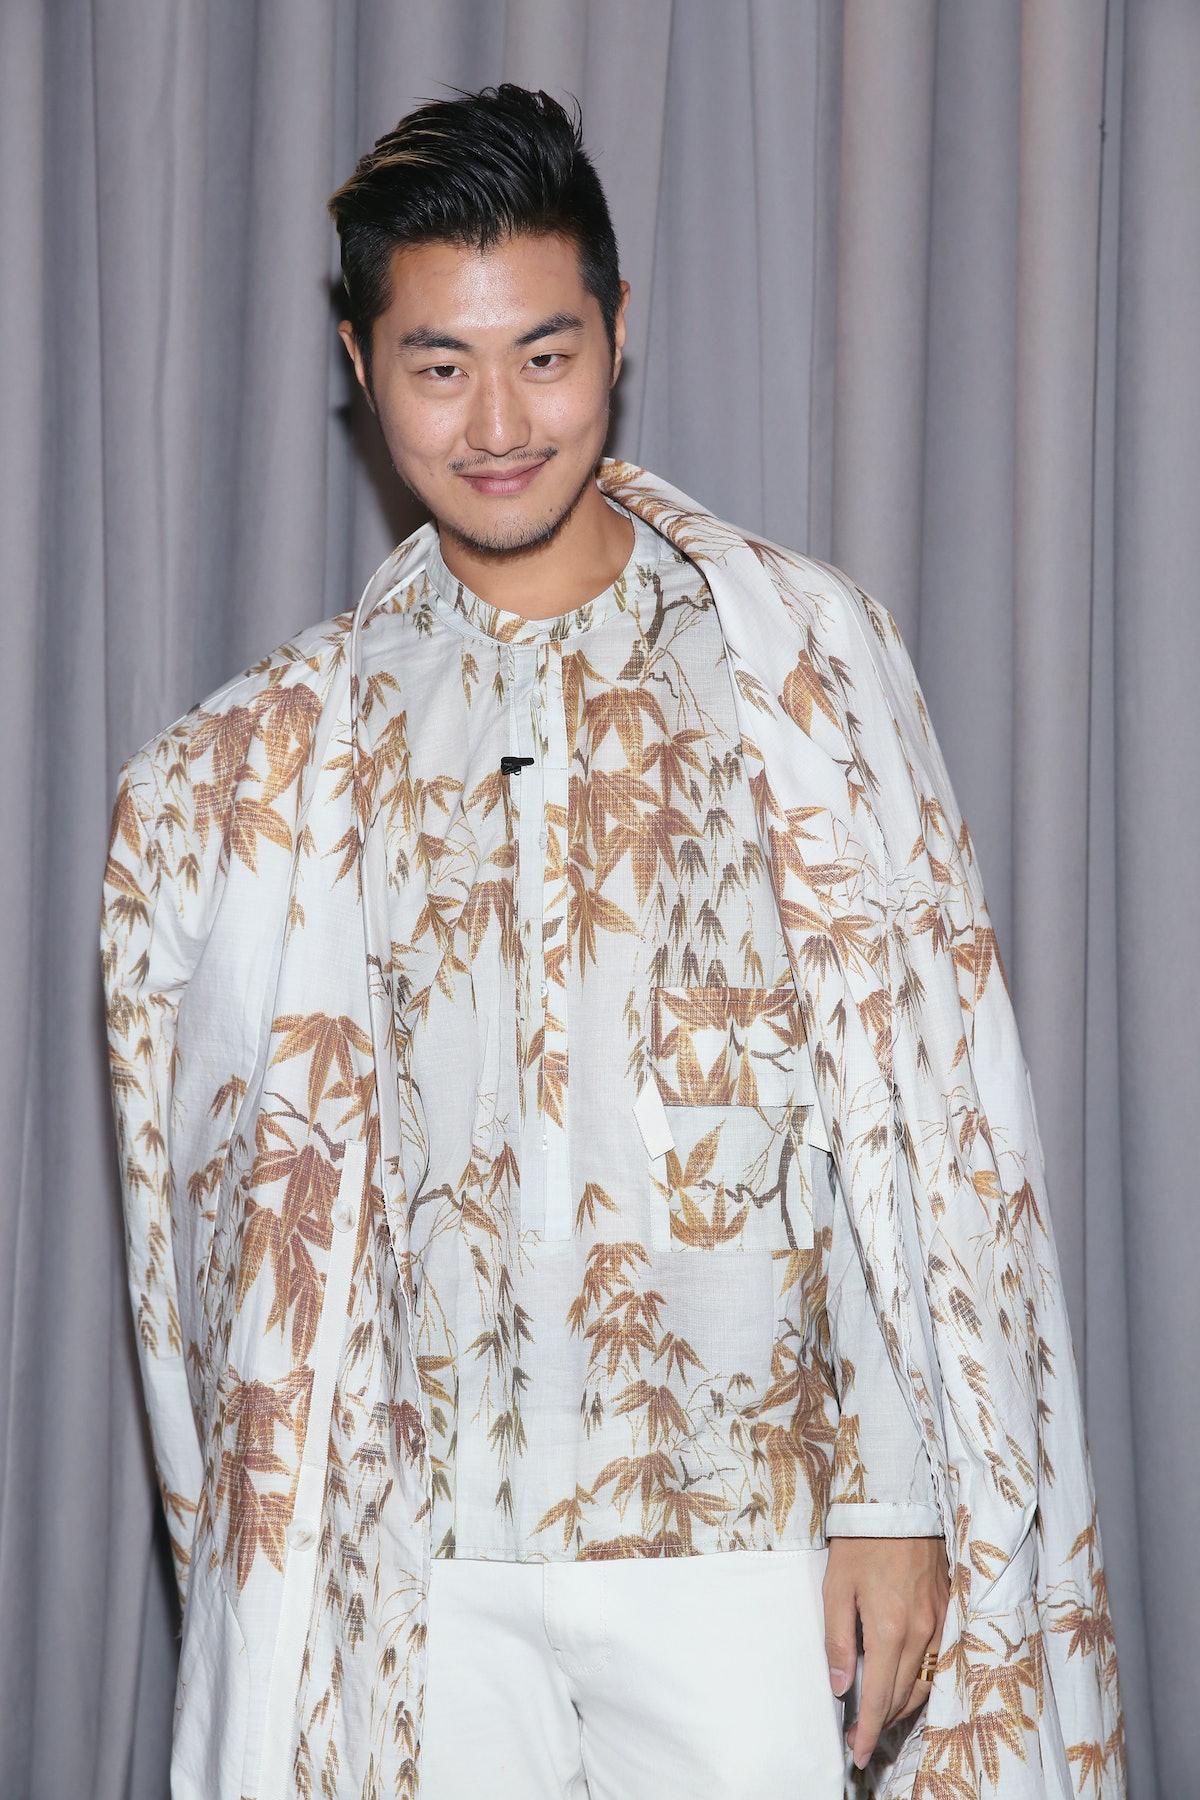 NEW YORK, NY - SEPTEMBER 16:  Fashion editor of Mashable, David Yi poses backstage at The Fat Jew fa...